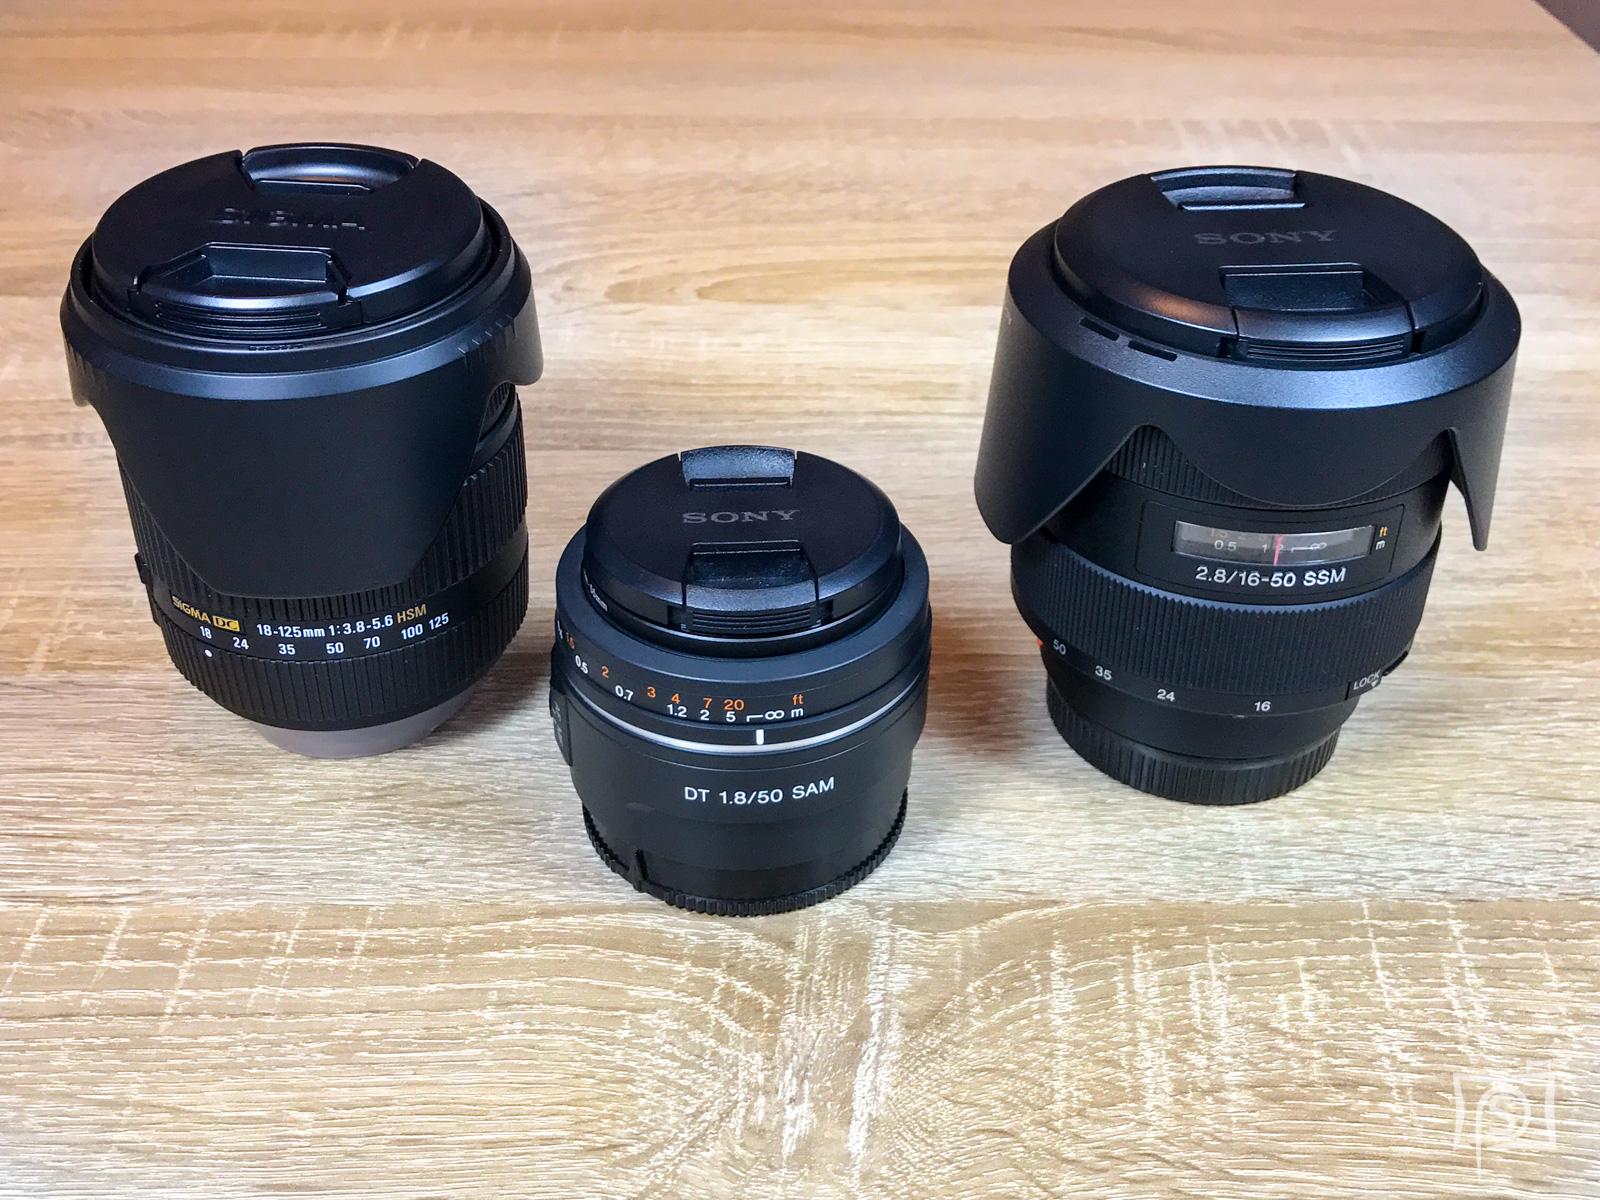 Sigma 18-125 mm vs. Sony SAL50 und SAL1650